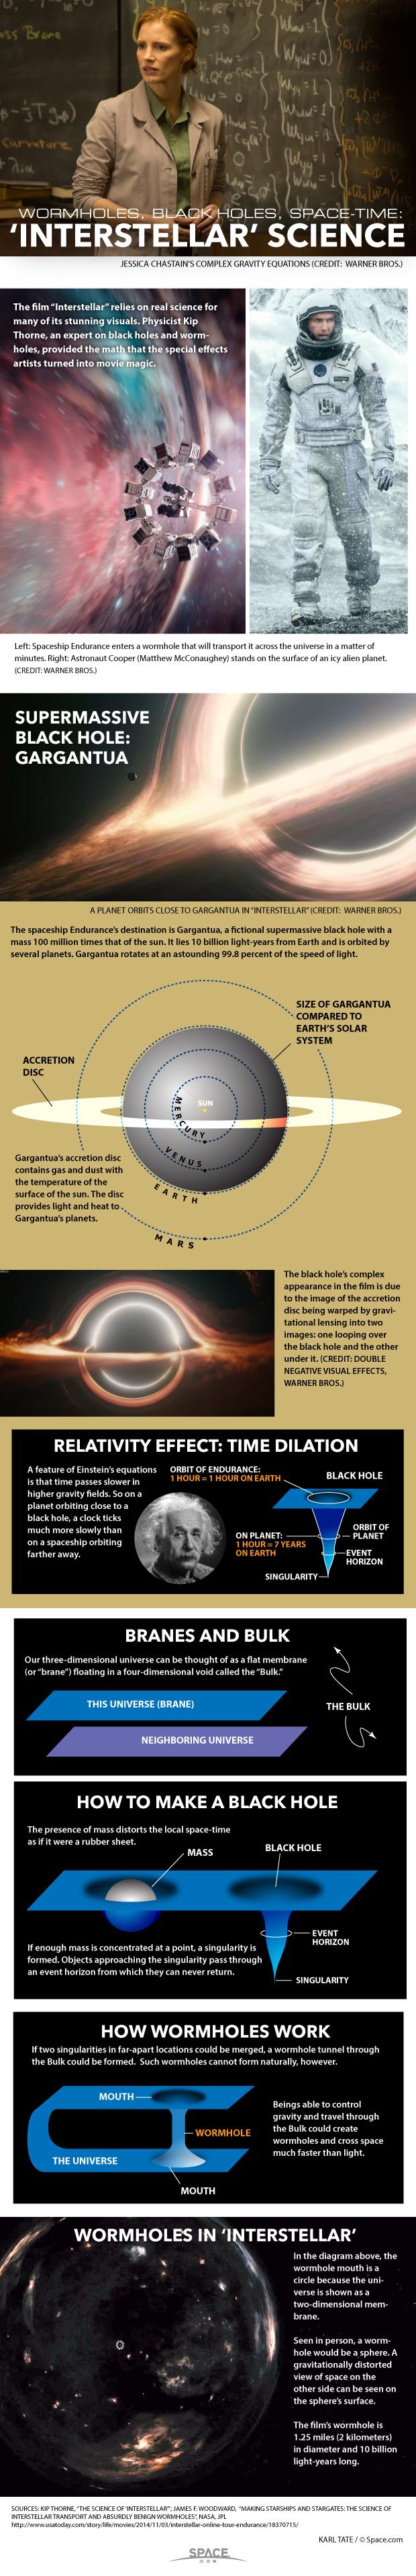 Wormhole Time Travel Wikipedia